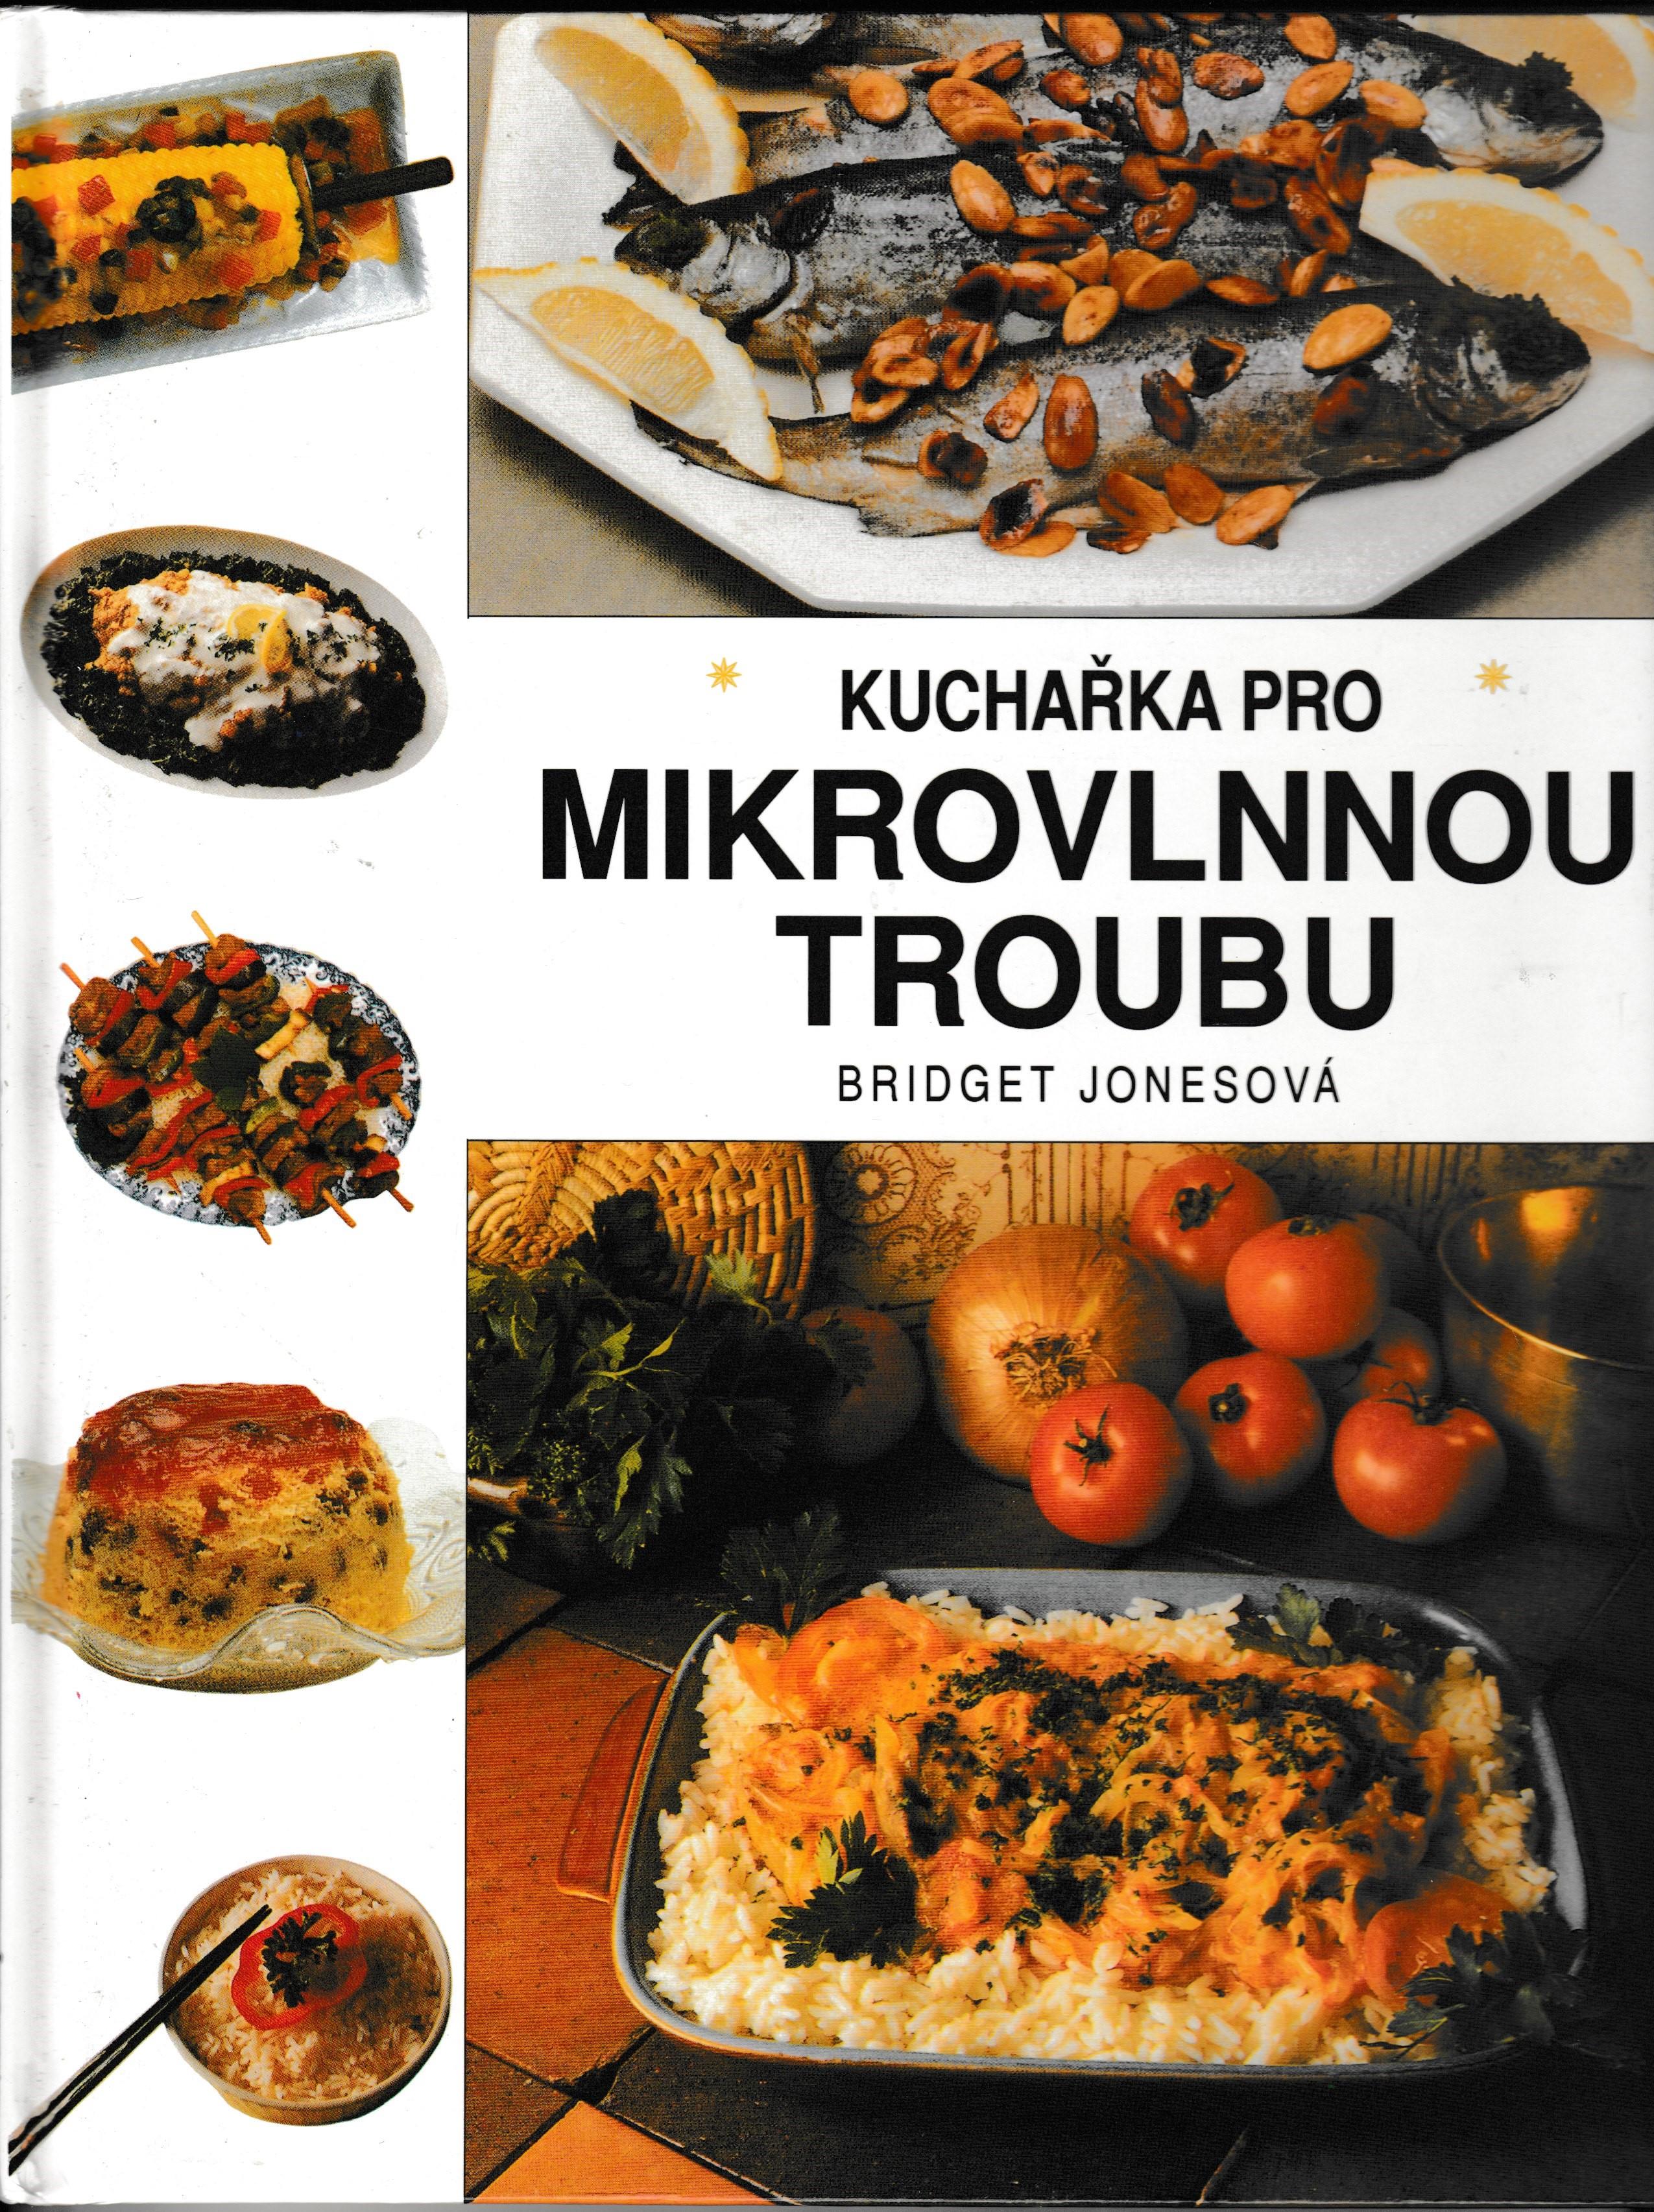 Kuchařka pro mikrovlnnou troubu - Bridget Jonesová